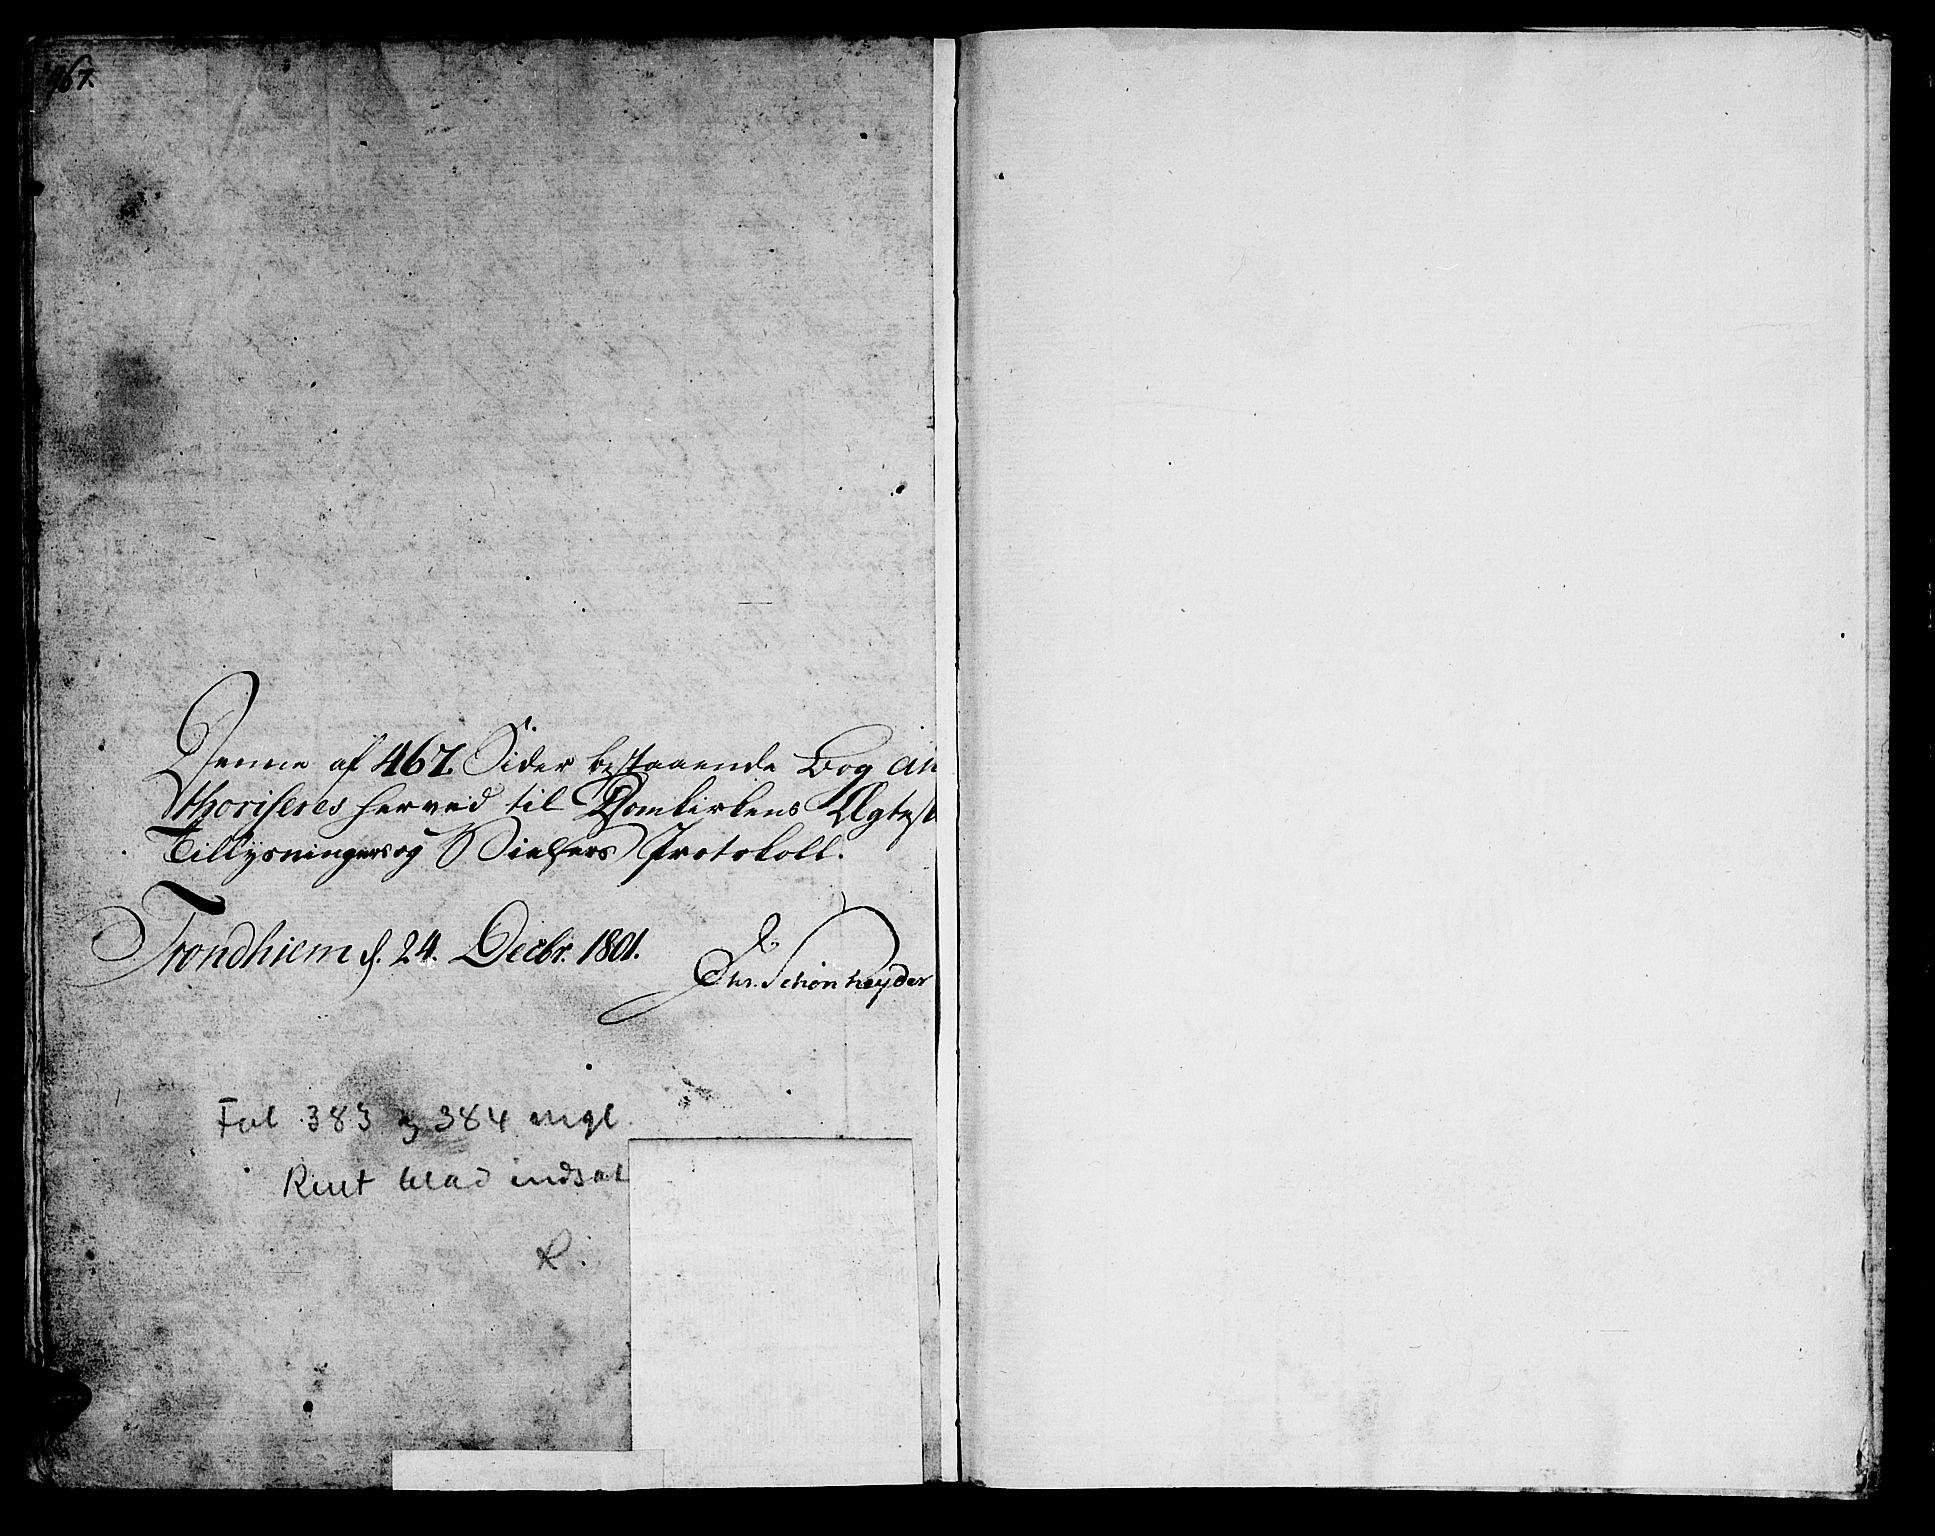 SAT, Ministerialprotokoller, klokkerbøker og fødselsregistre - Sør-Trøndelag, 601/L0042: Parish register (official) no. 601A10, 1802-1830, p. 467-468